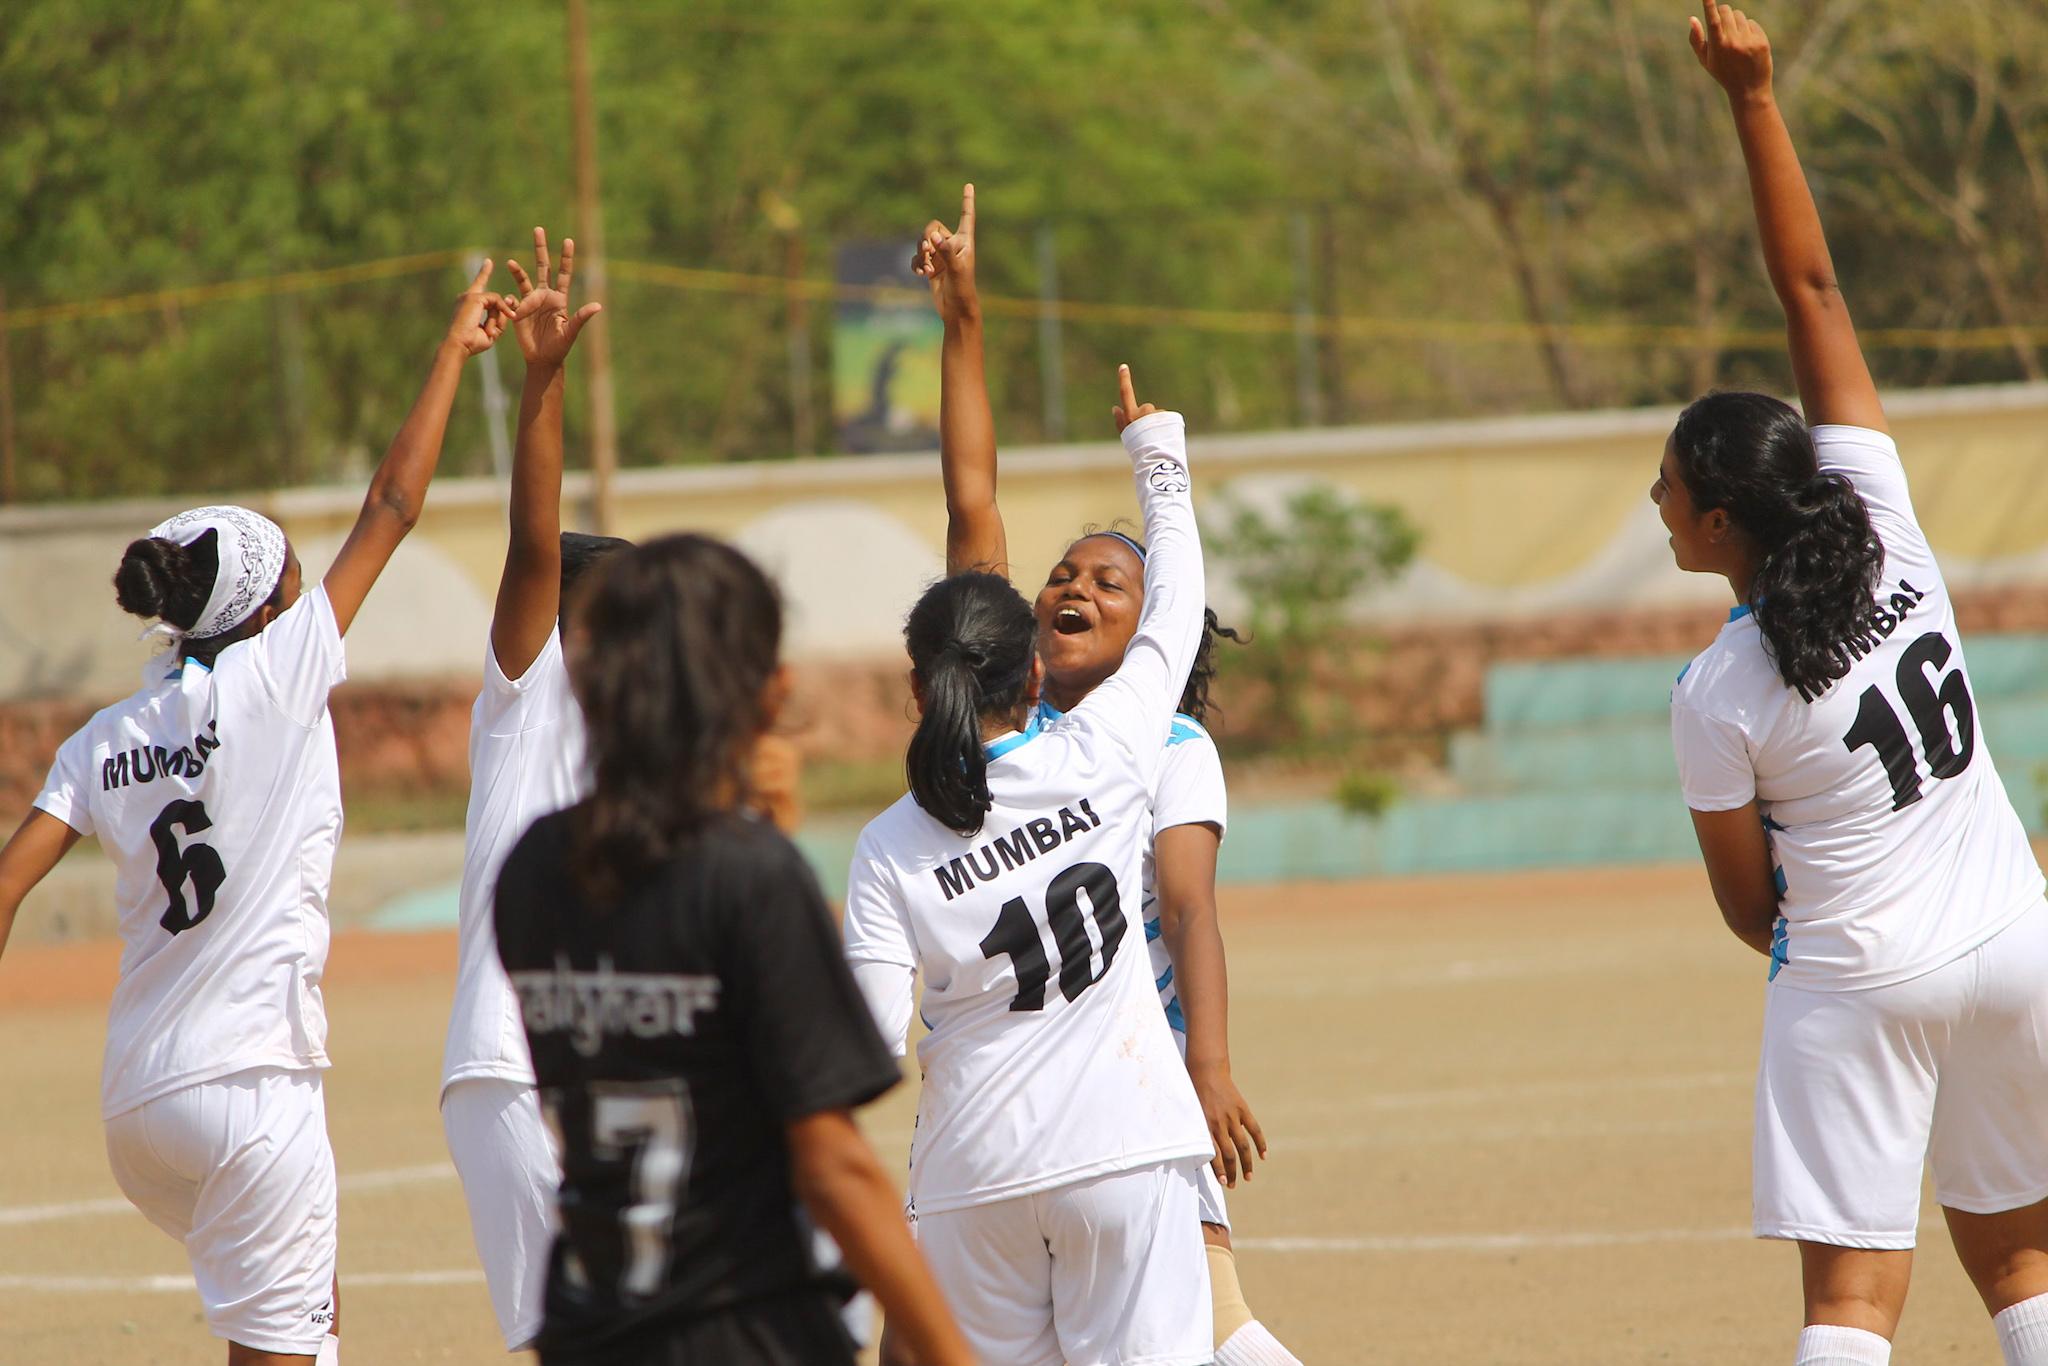 WIFA Women's Inter District Football: Kolhapur, Gondia win big to enter quarterfinals